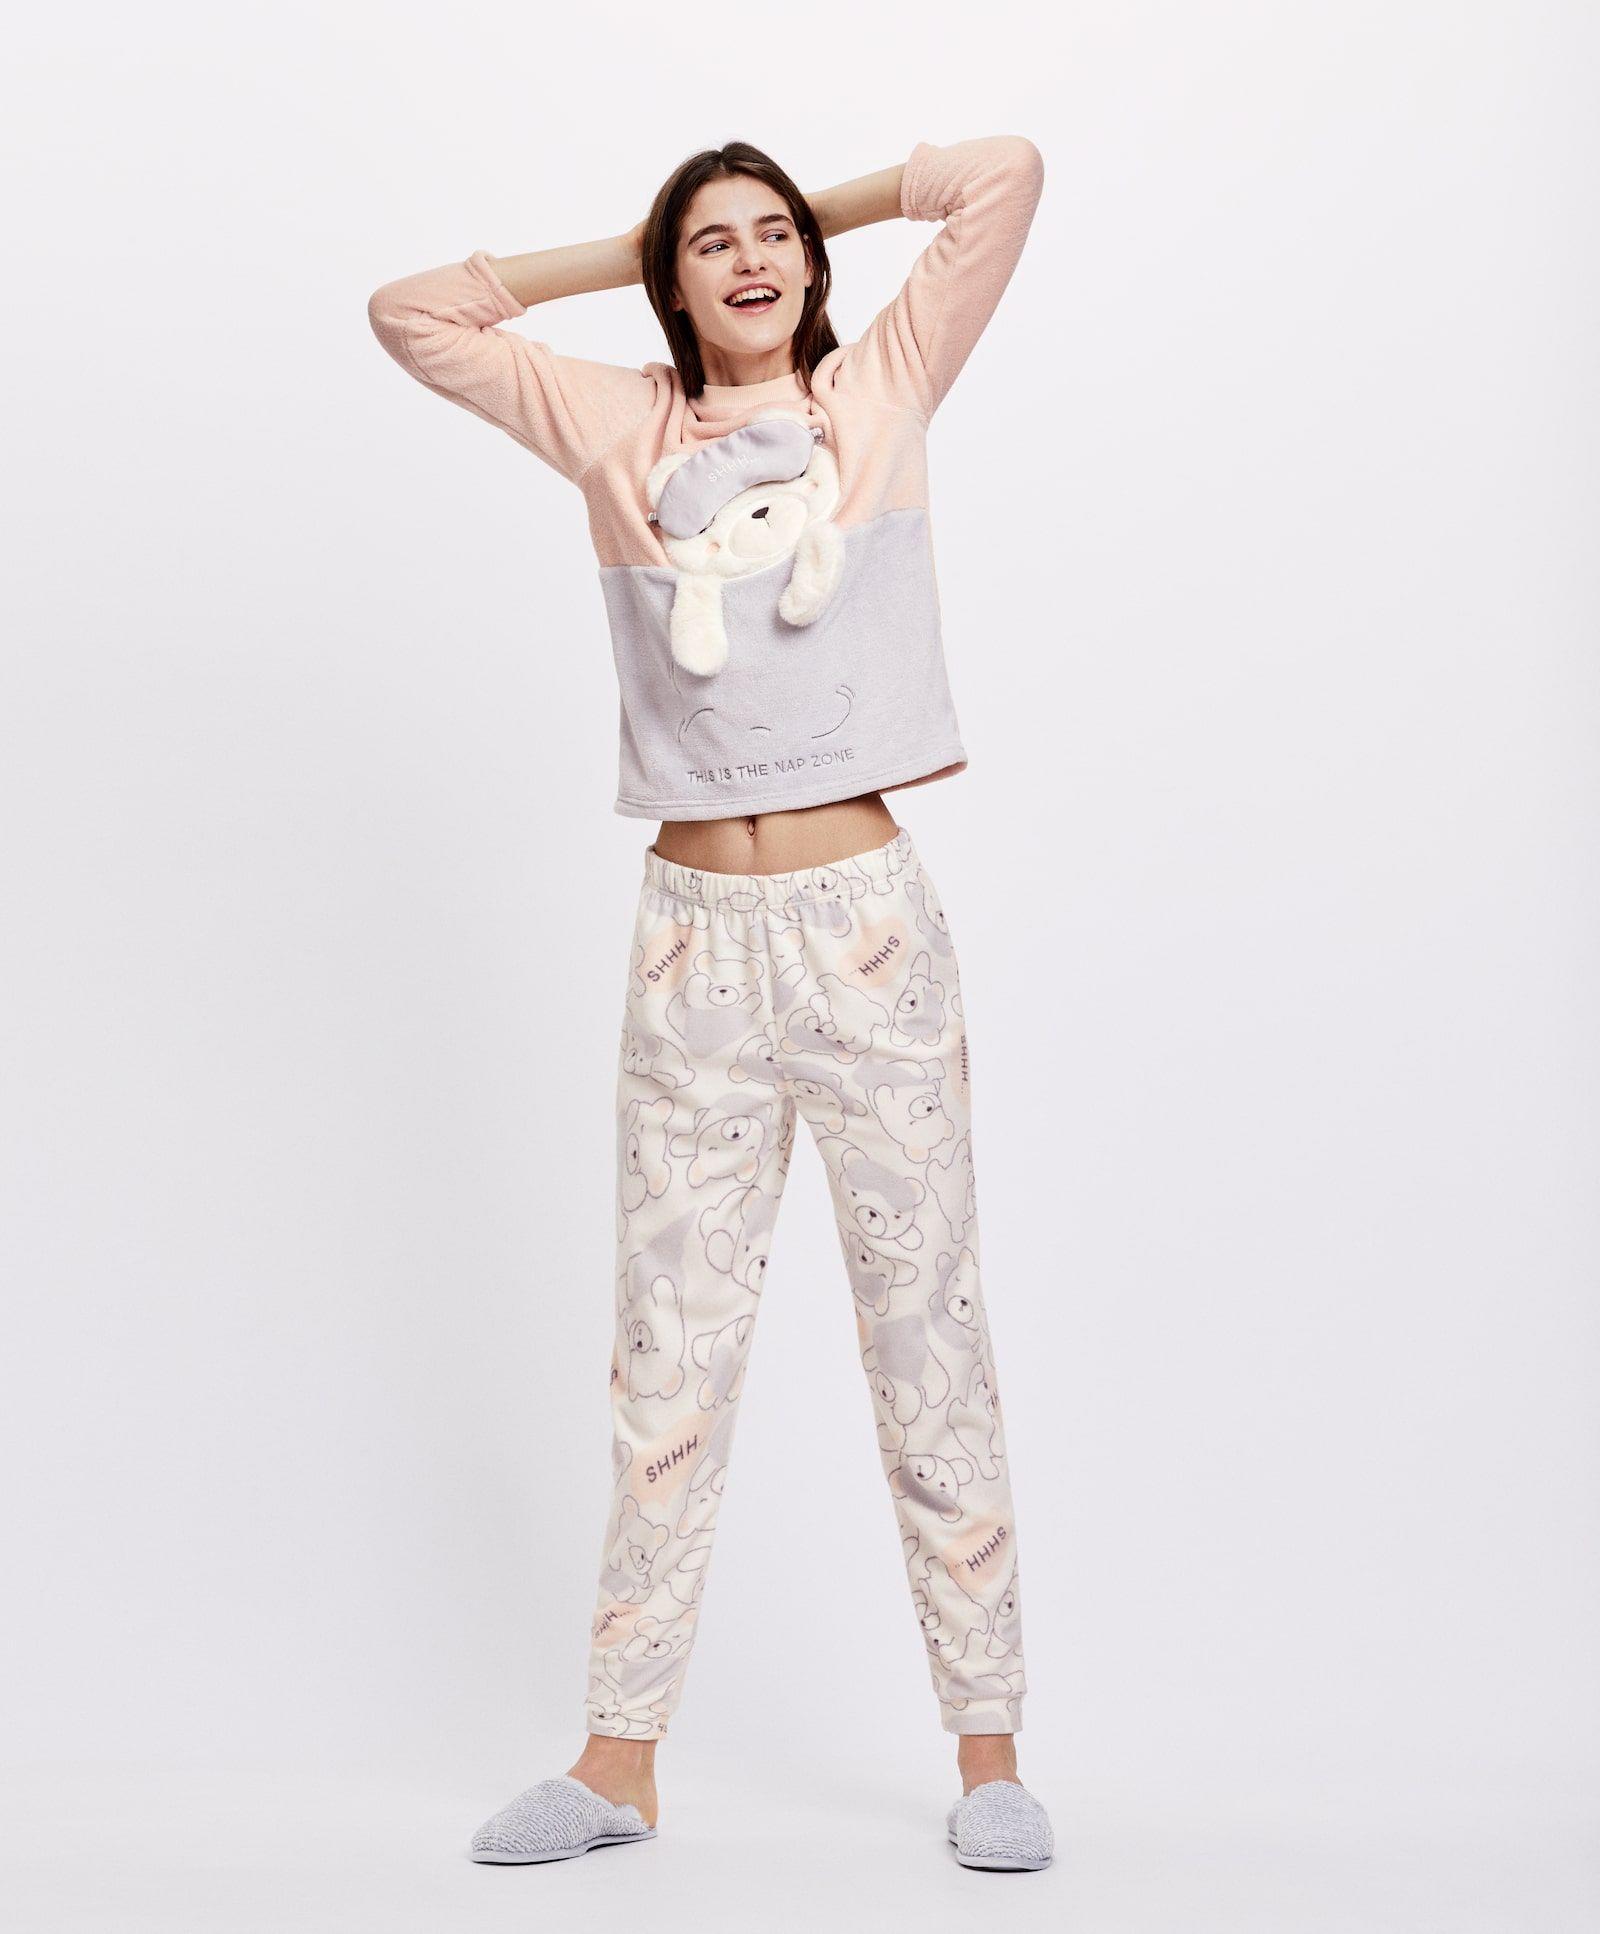 Fleece Active Joggers Elastic Pants DaXi1 Seal Sweatpants for Boys /& Girls